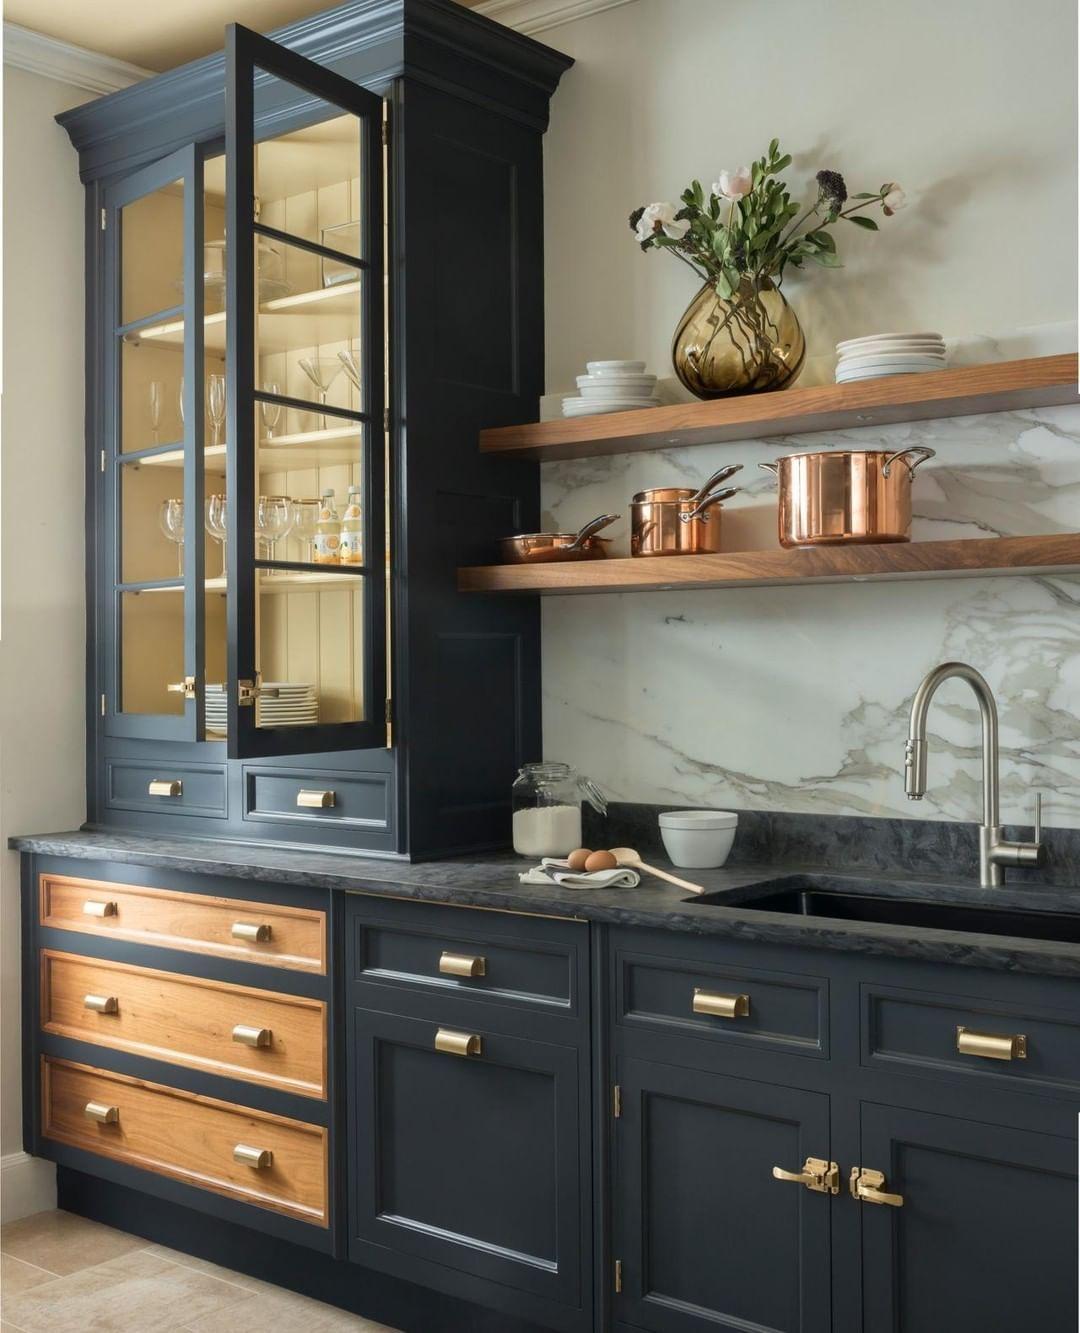 Dark kitchen cabinets, open shelves, brass hardware, and a ...